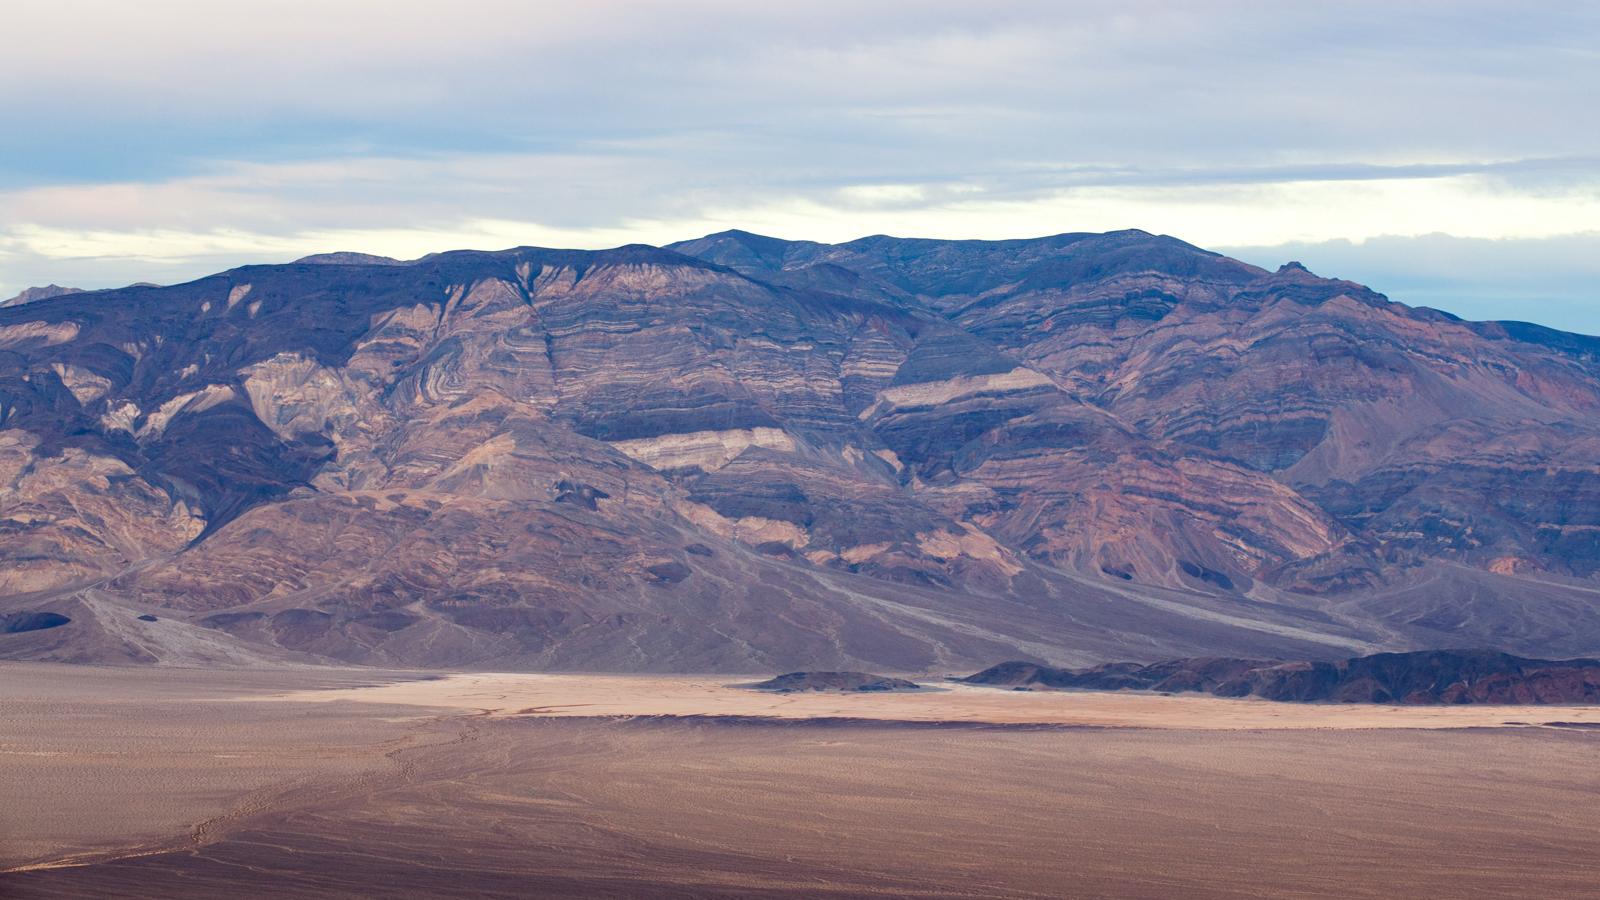 Geology - Death Valley, California - 2013